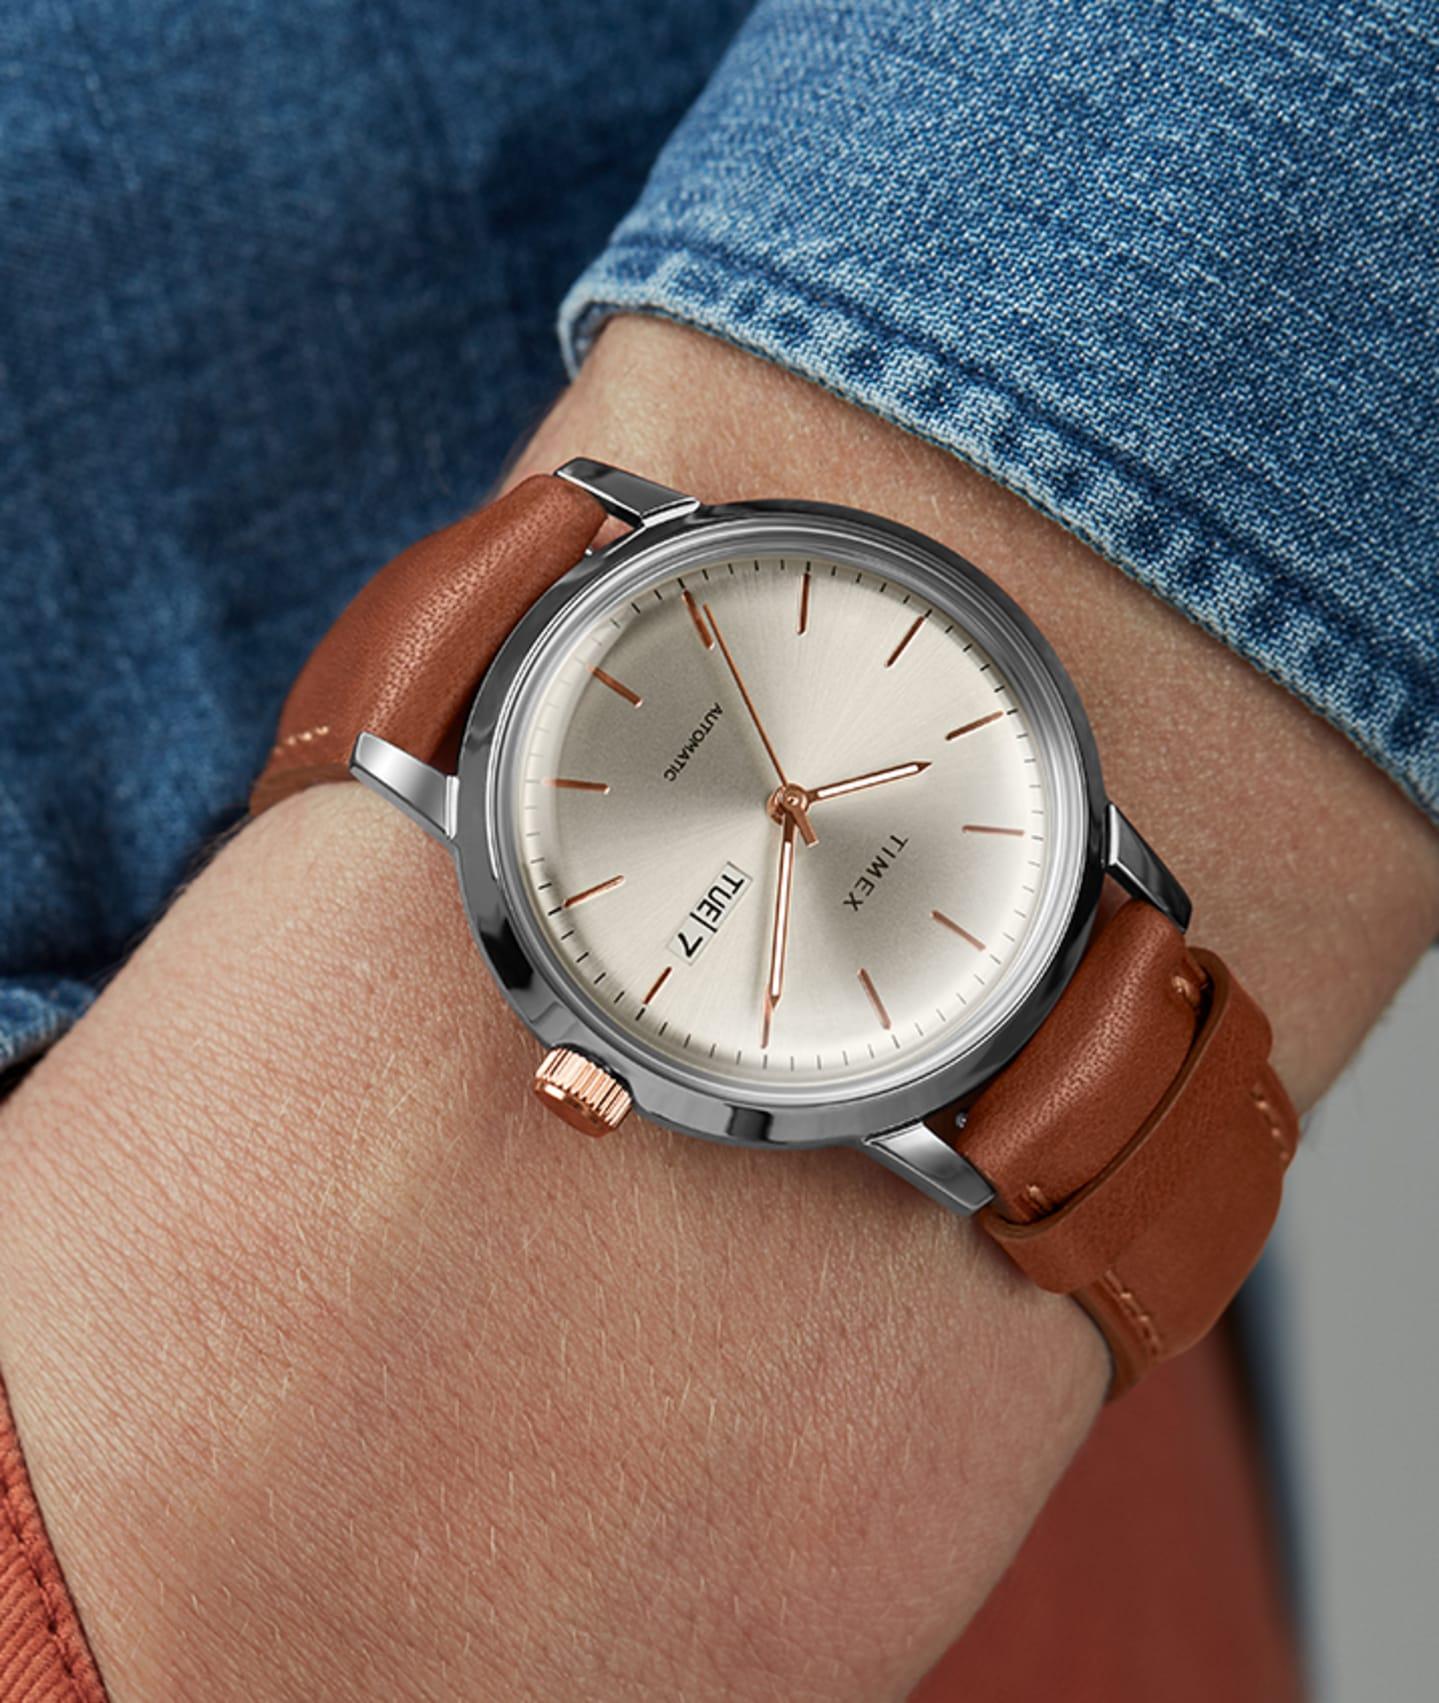 Marlin Automatic Watch.